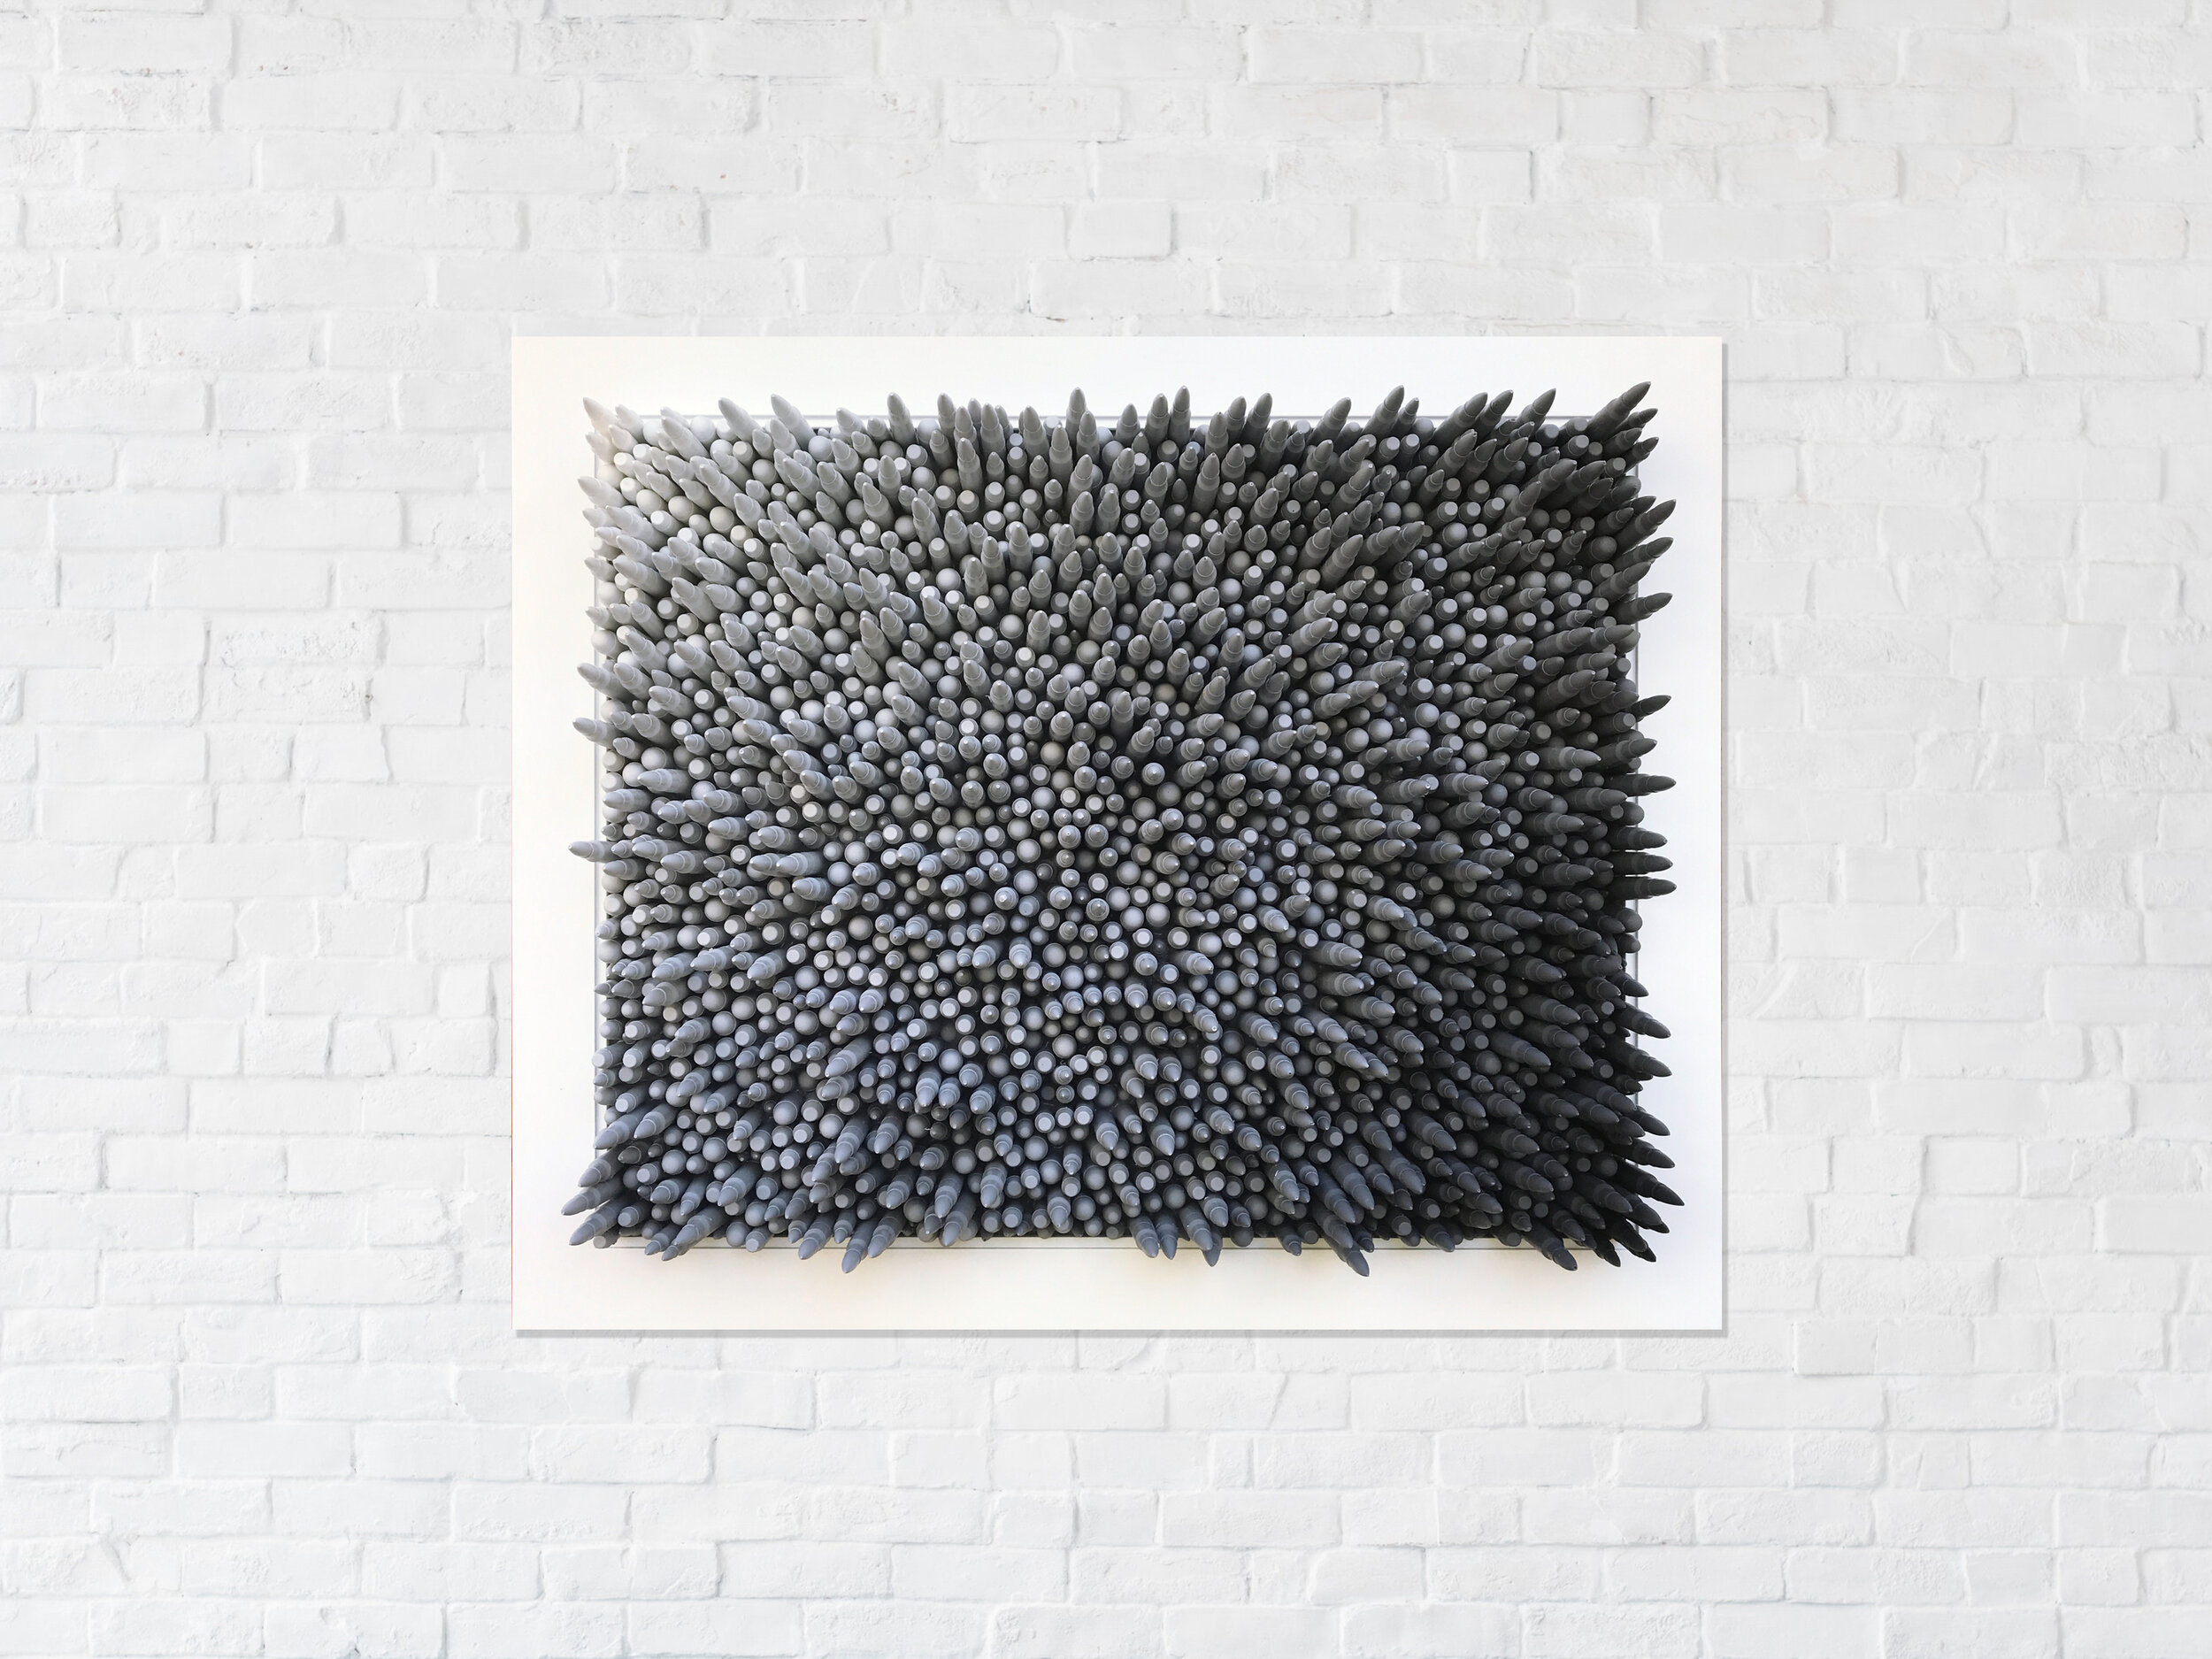 loaded fade in grey - 1,850 hand cast bullets